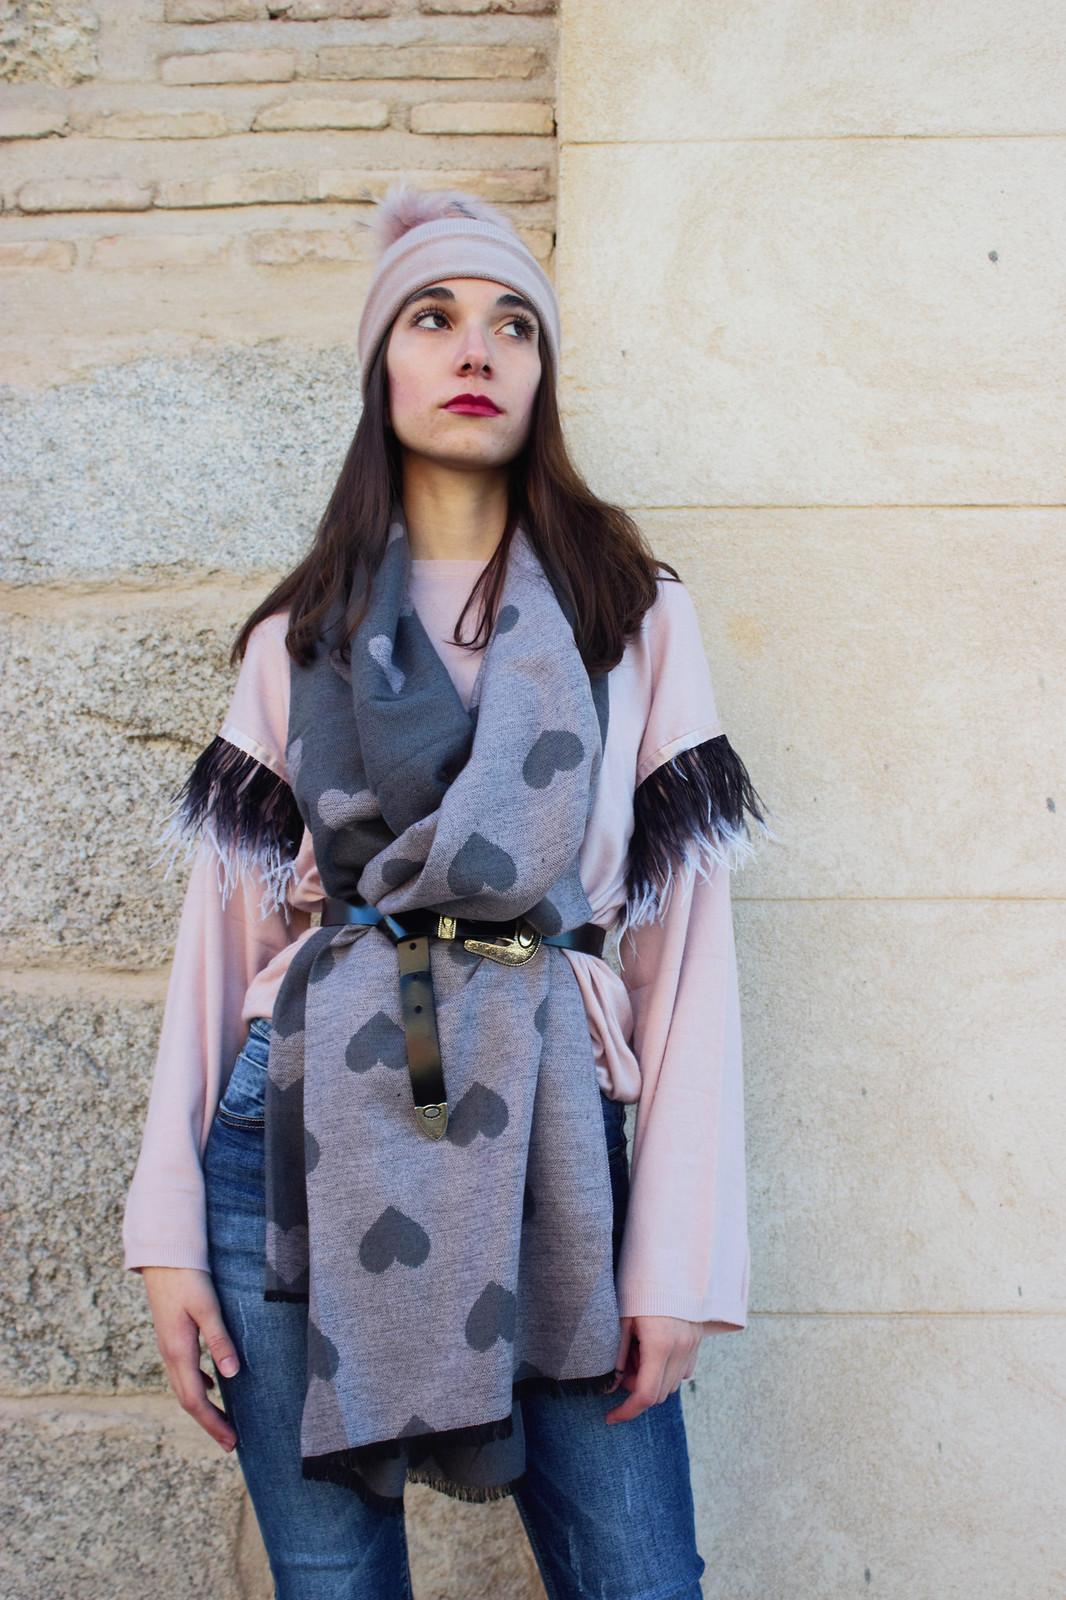 madlula-fashion-style-chic-pashmina-love-reversible-gris-rosa-gorro-pompón-sweater-paris-rosa-jeans-adriana-fashion